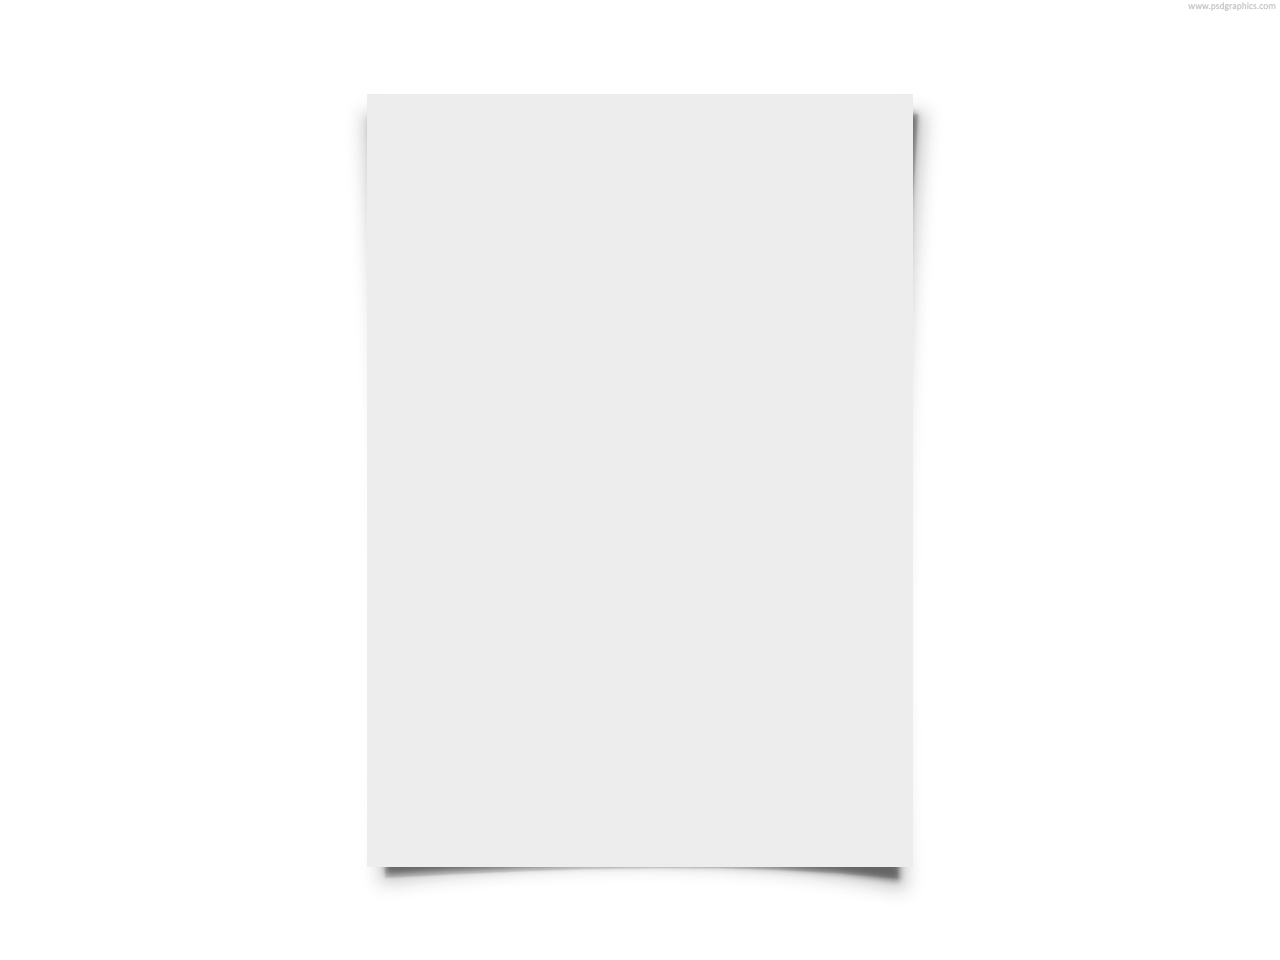 Paper Sheet PNG Transparent Paper Sheet.PNG Images. | PlusPNG